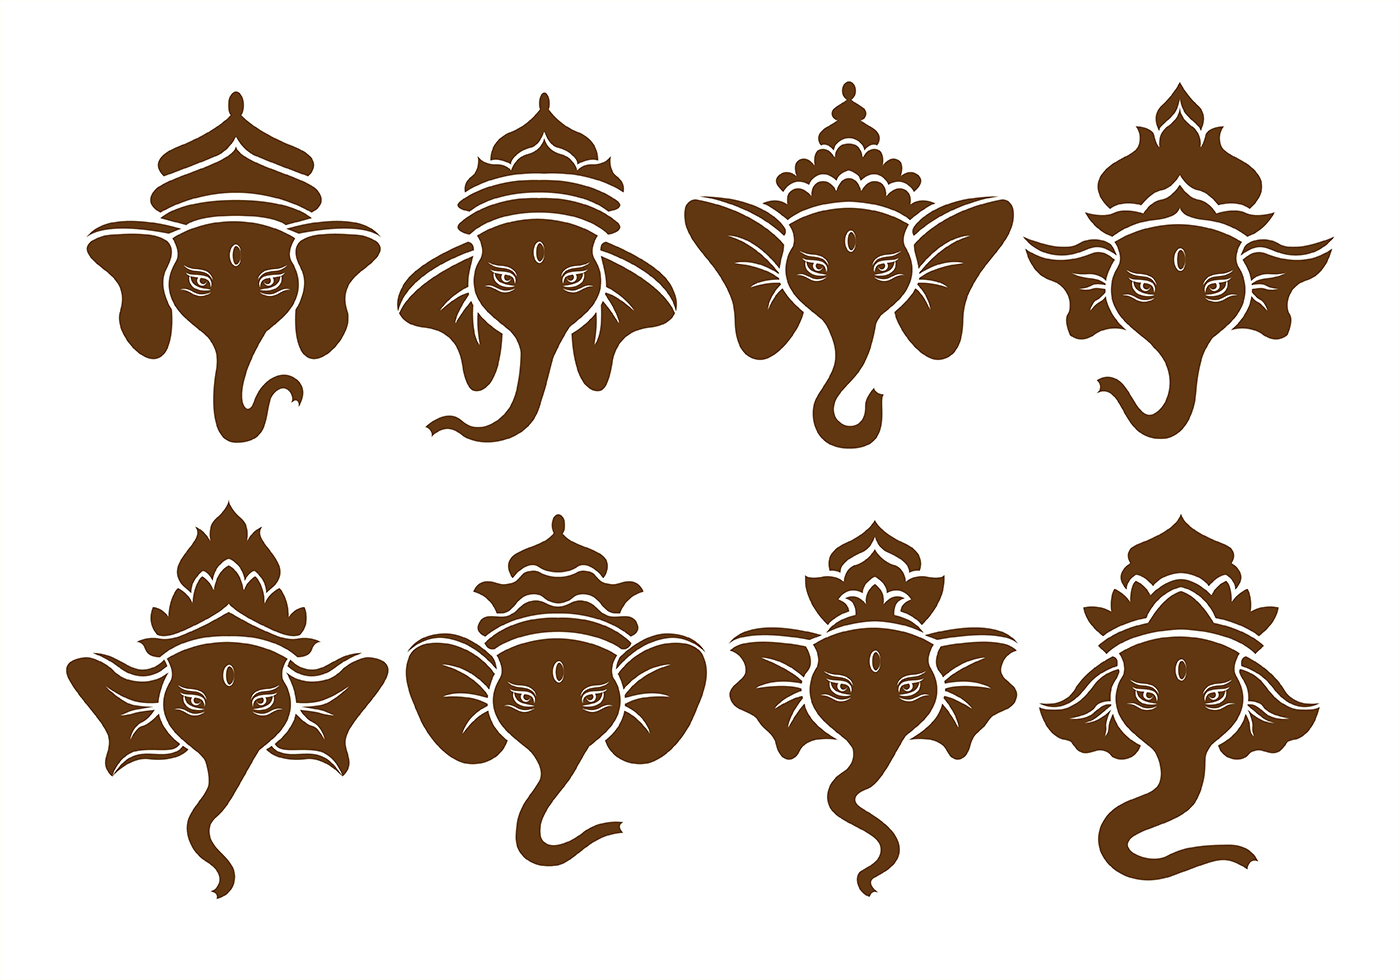 Ganesha outline symbol download free vector art stock graphics brown ganesh icons buycottarizona